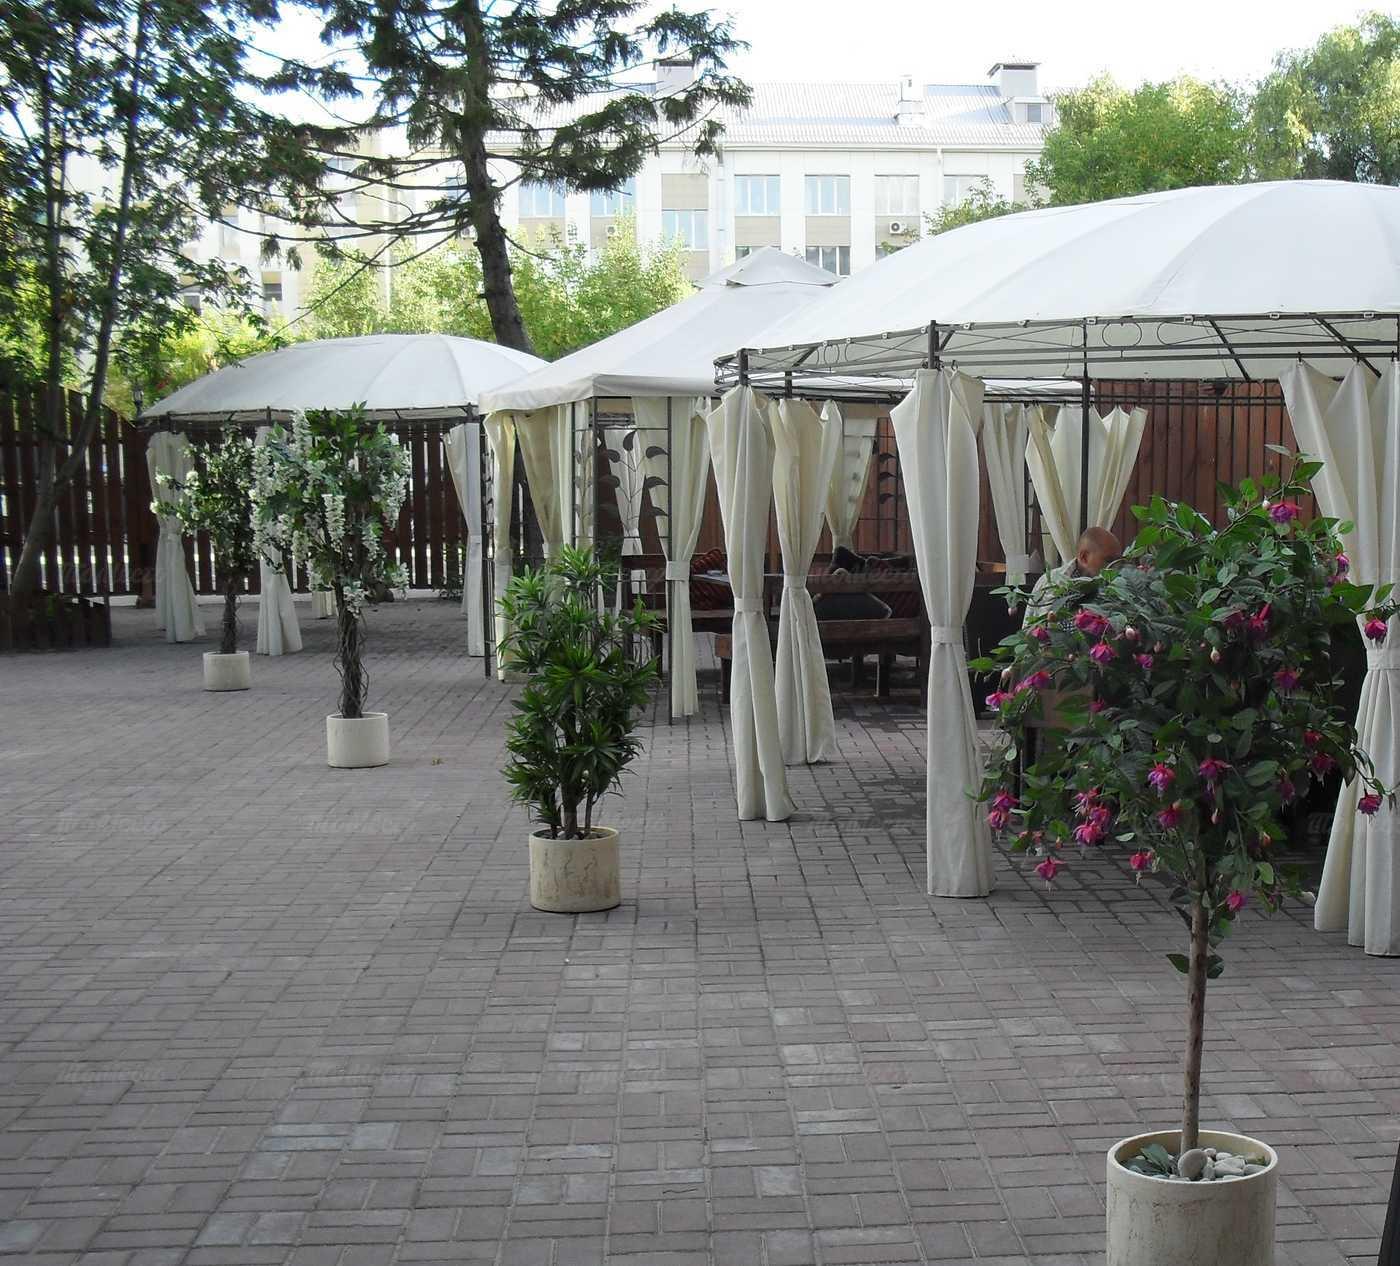 Меню кафе, ресторана Халиф на улице Фрунзе